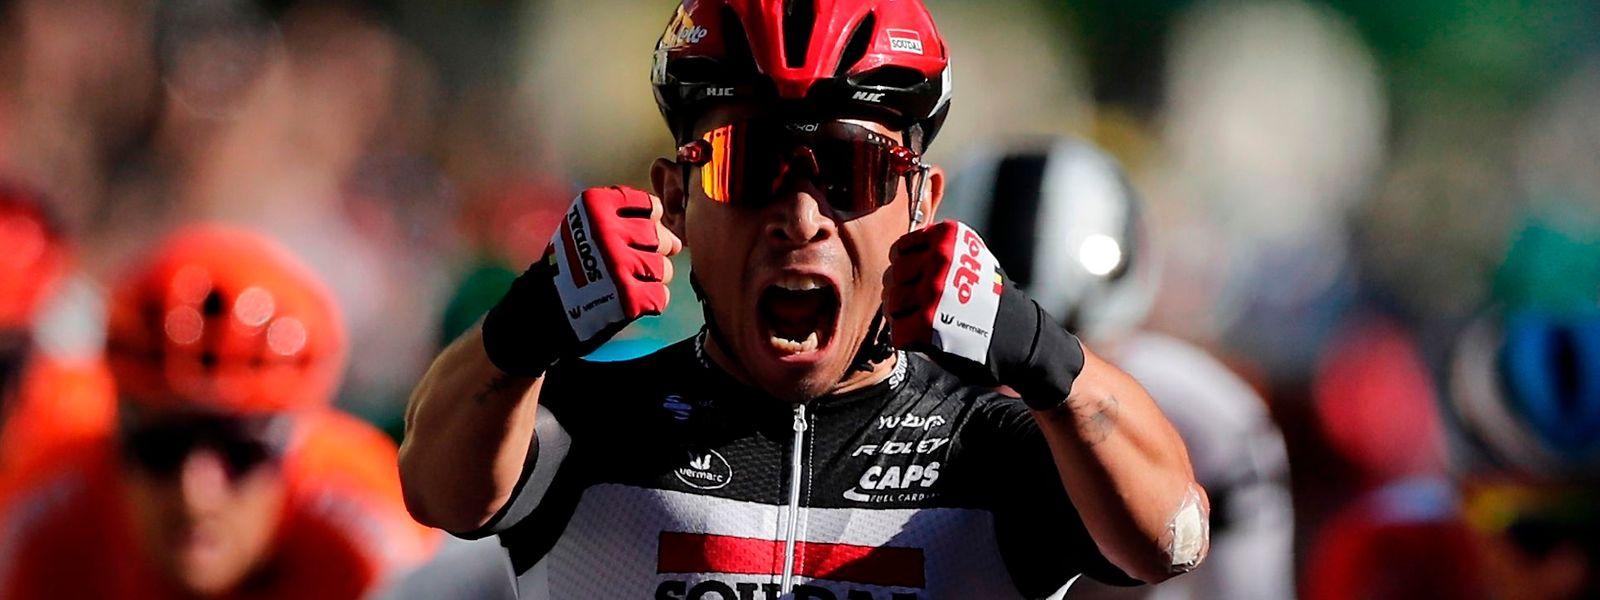 Caleb Ewan feier seinen vierten Tour-Etappensieg.